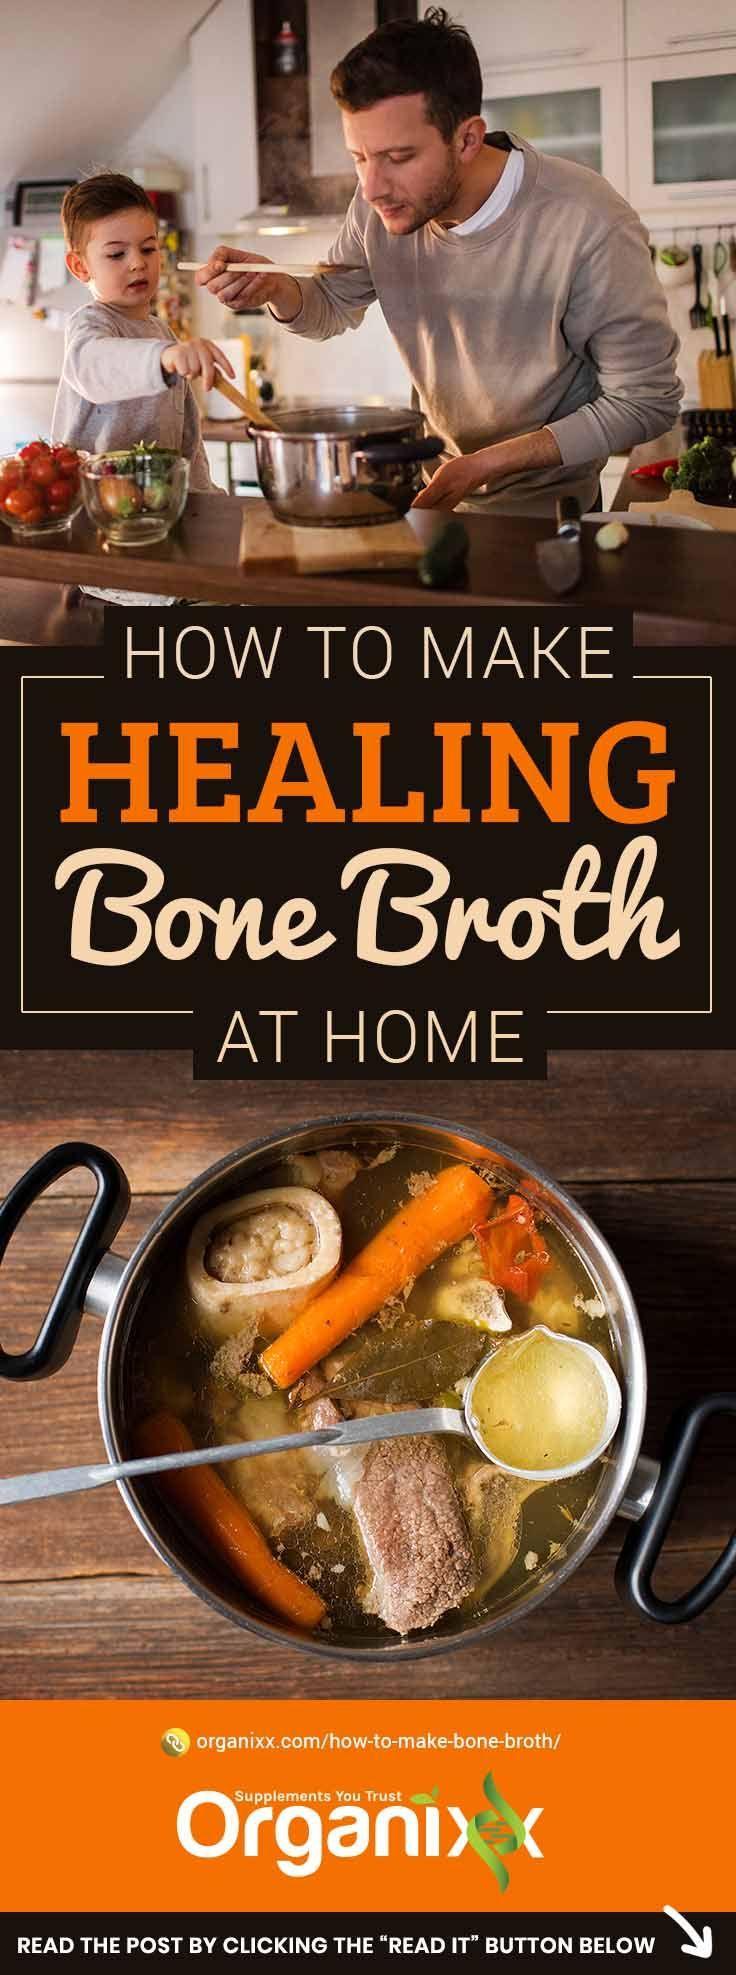 How to Make Healing Bone Broth at Home #bonebrothrecipe